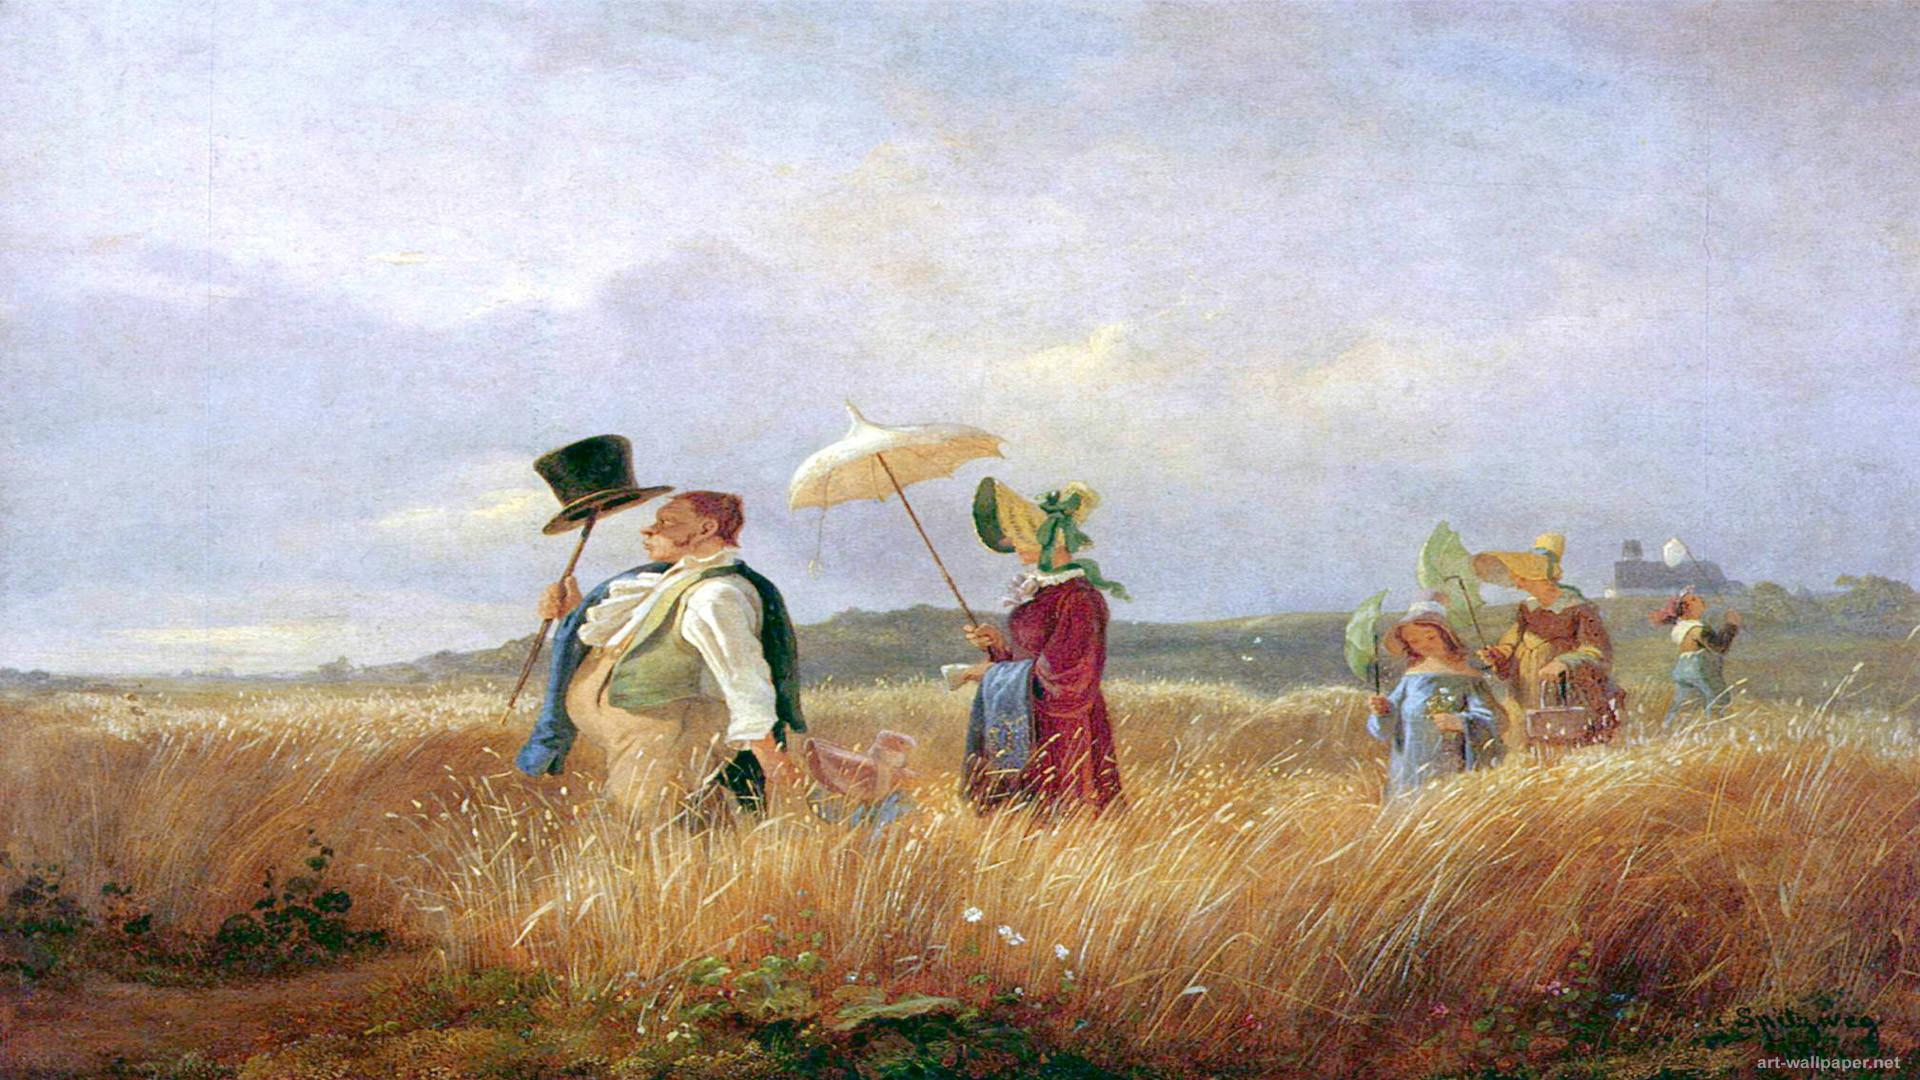 Res: 1920x1080, Carl Spitzweg Paintings wallpaper